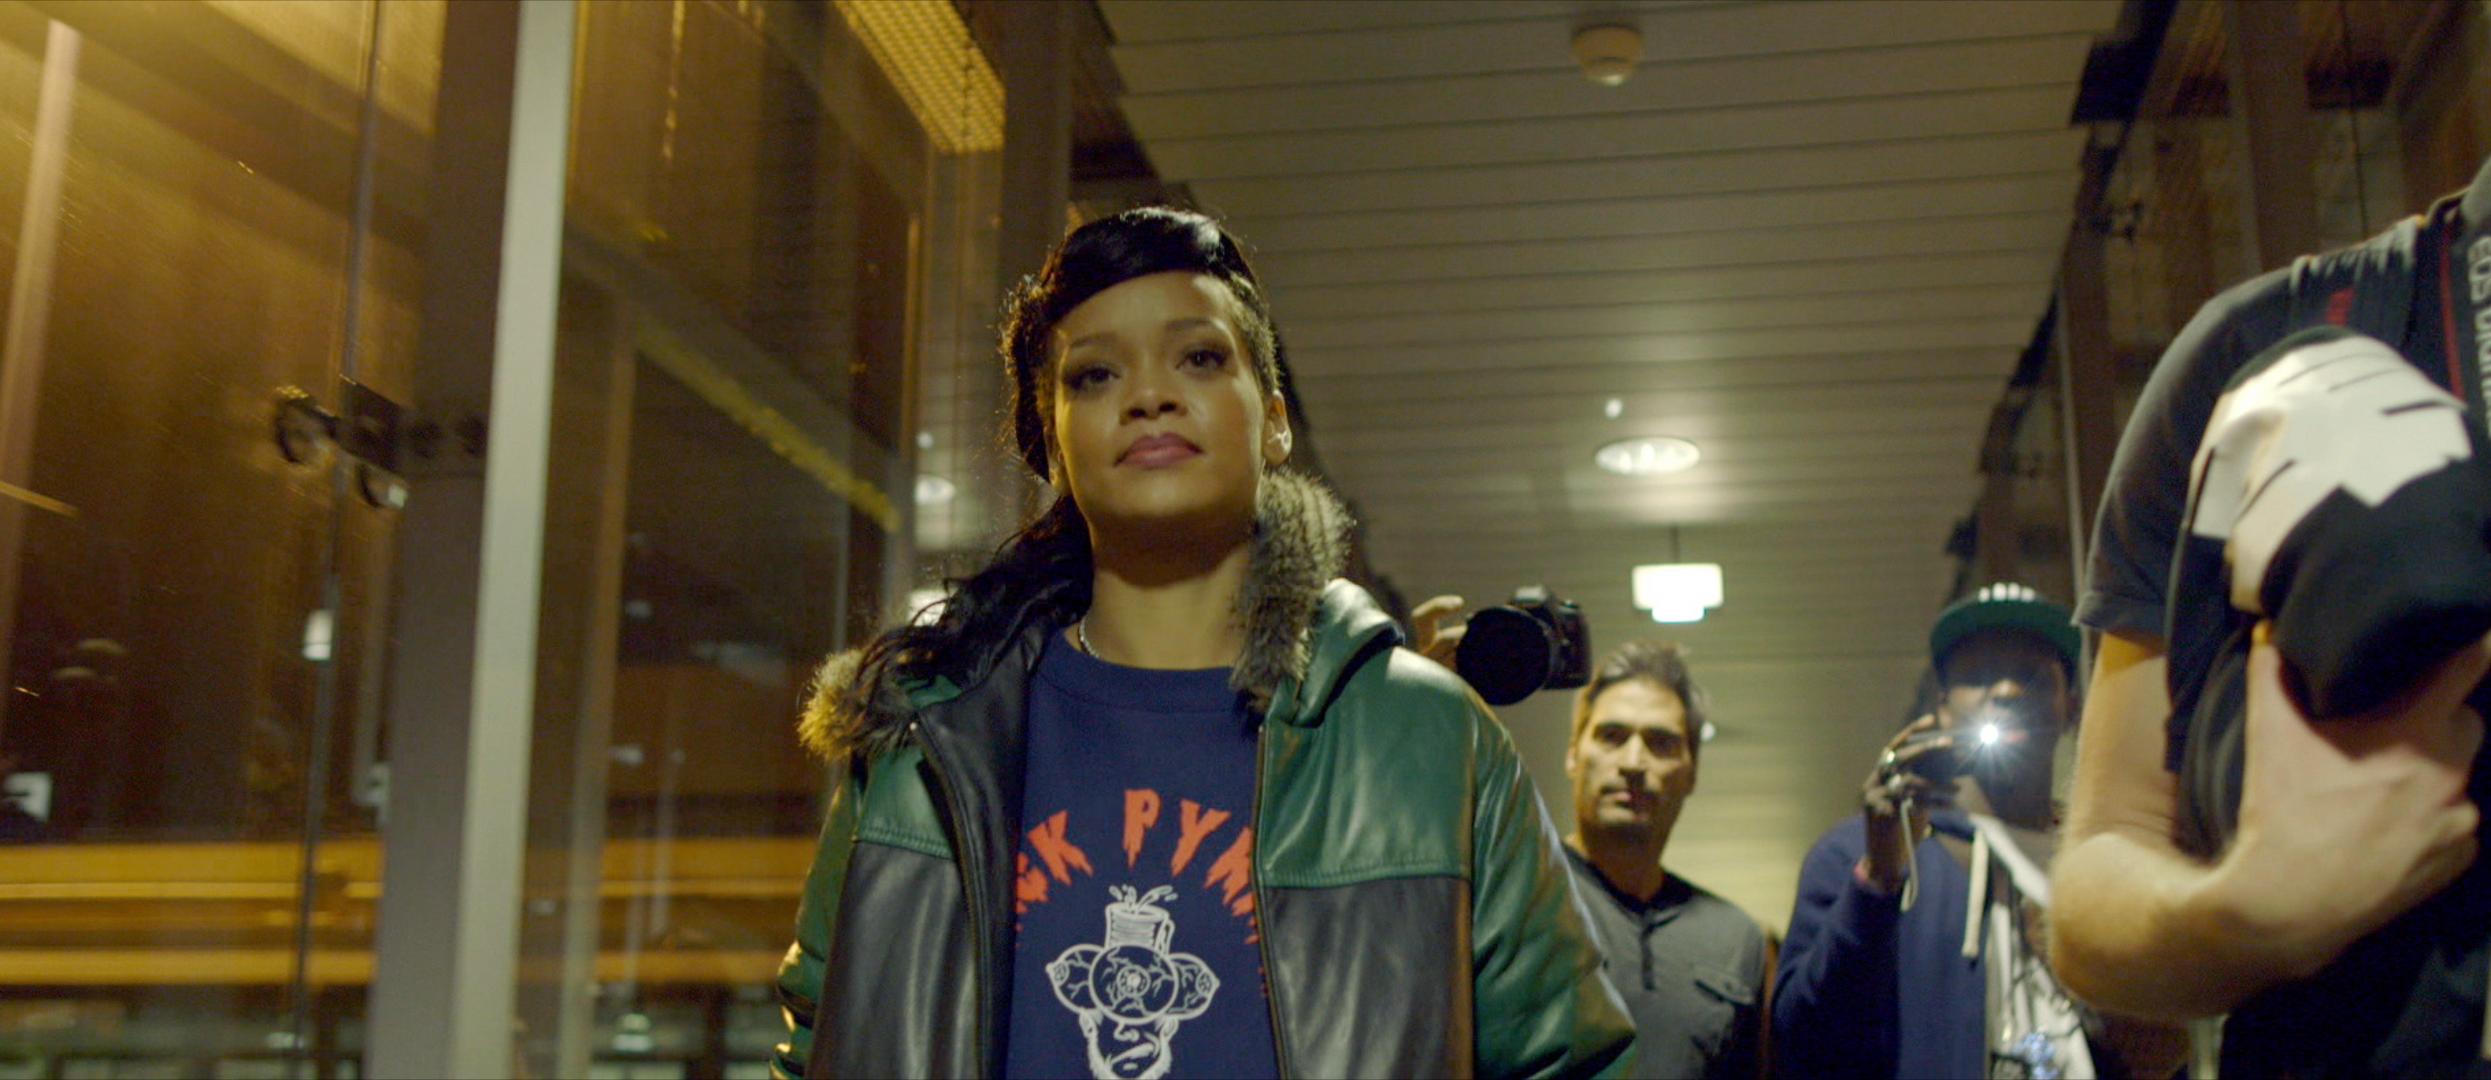 Rihanna2.png